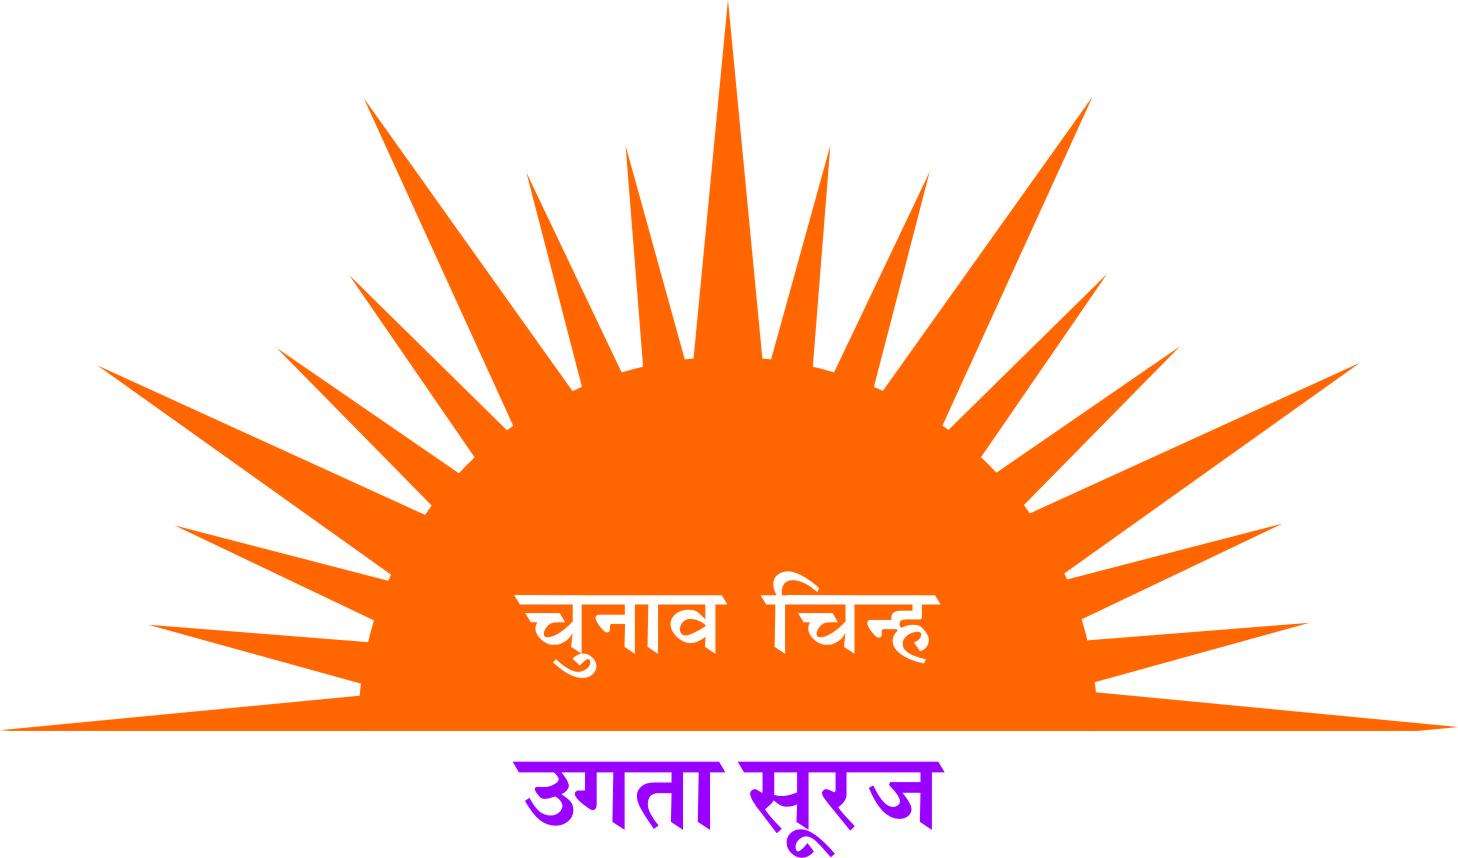 Suraj logo download - www tcgahhmfgxm ml